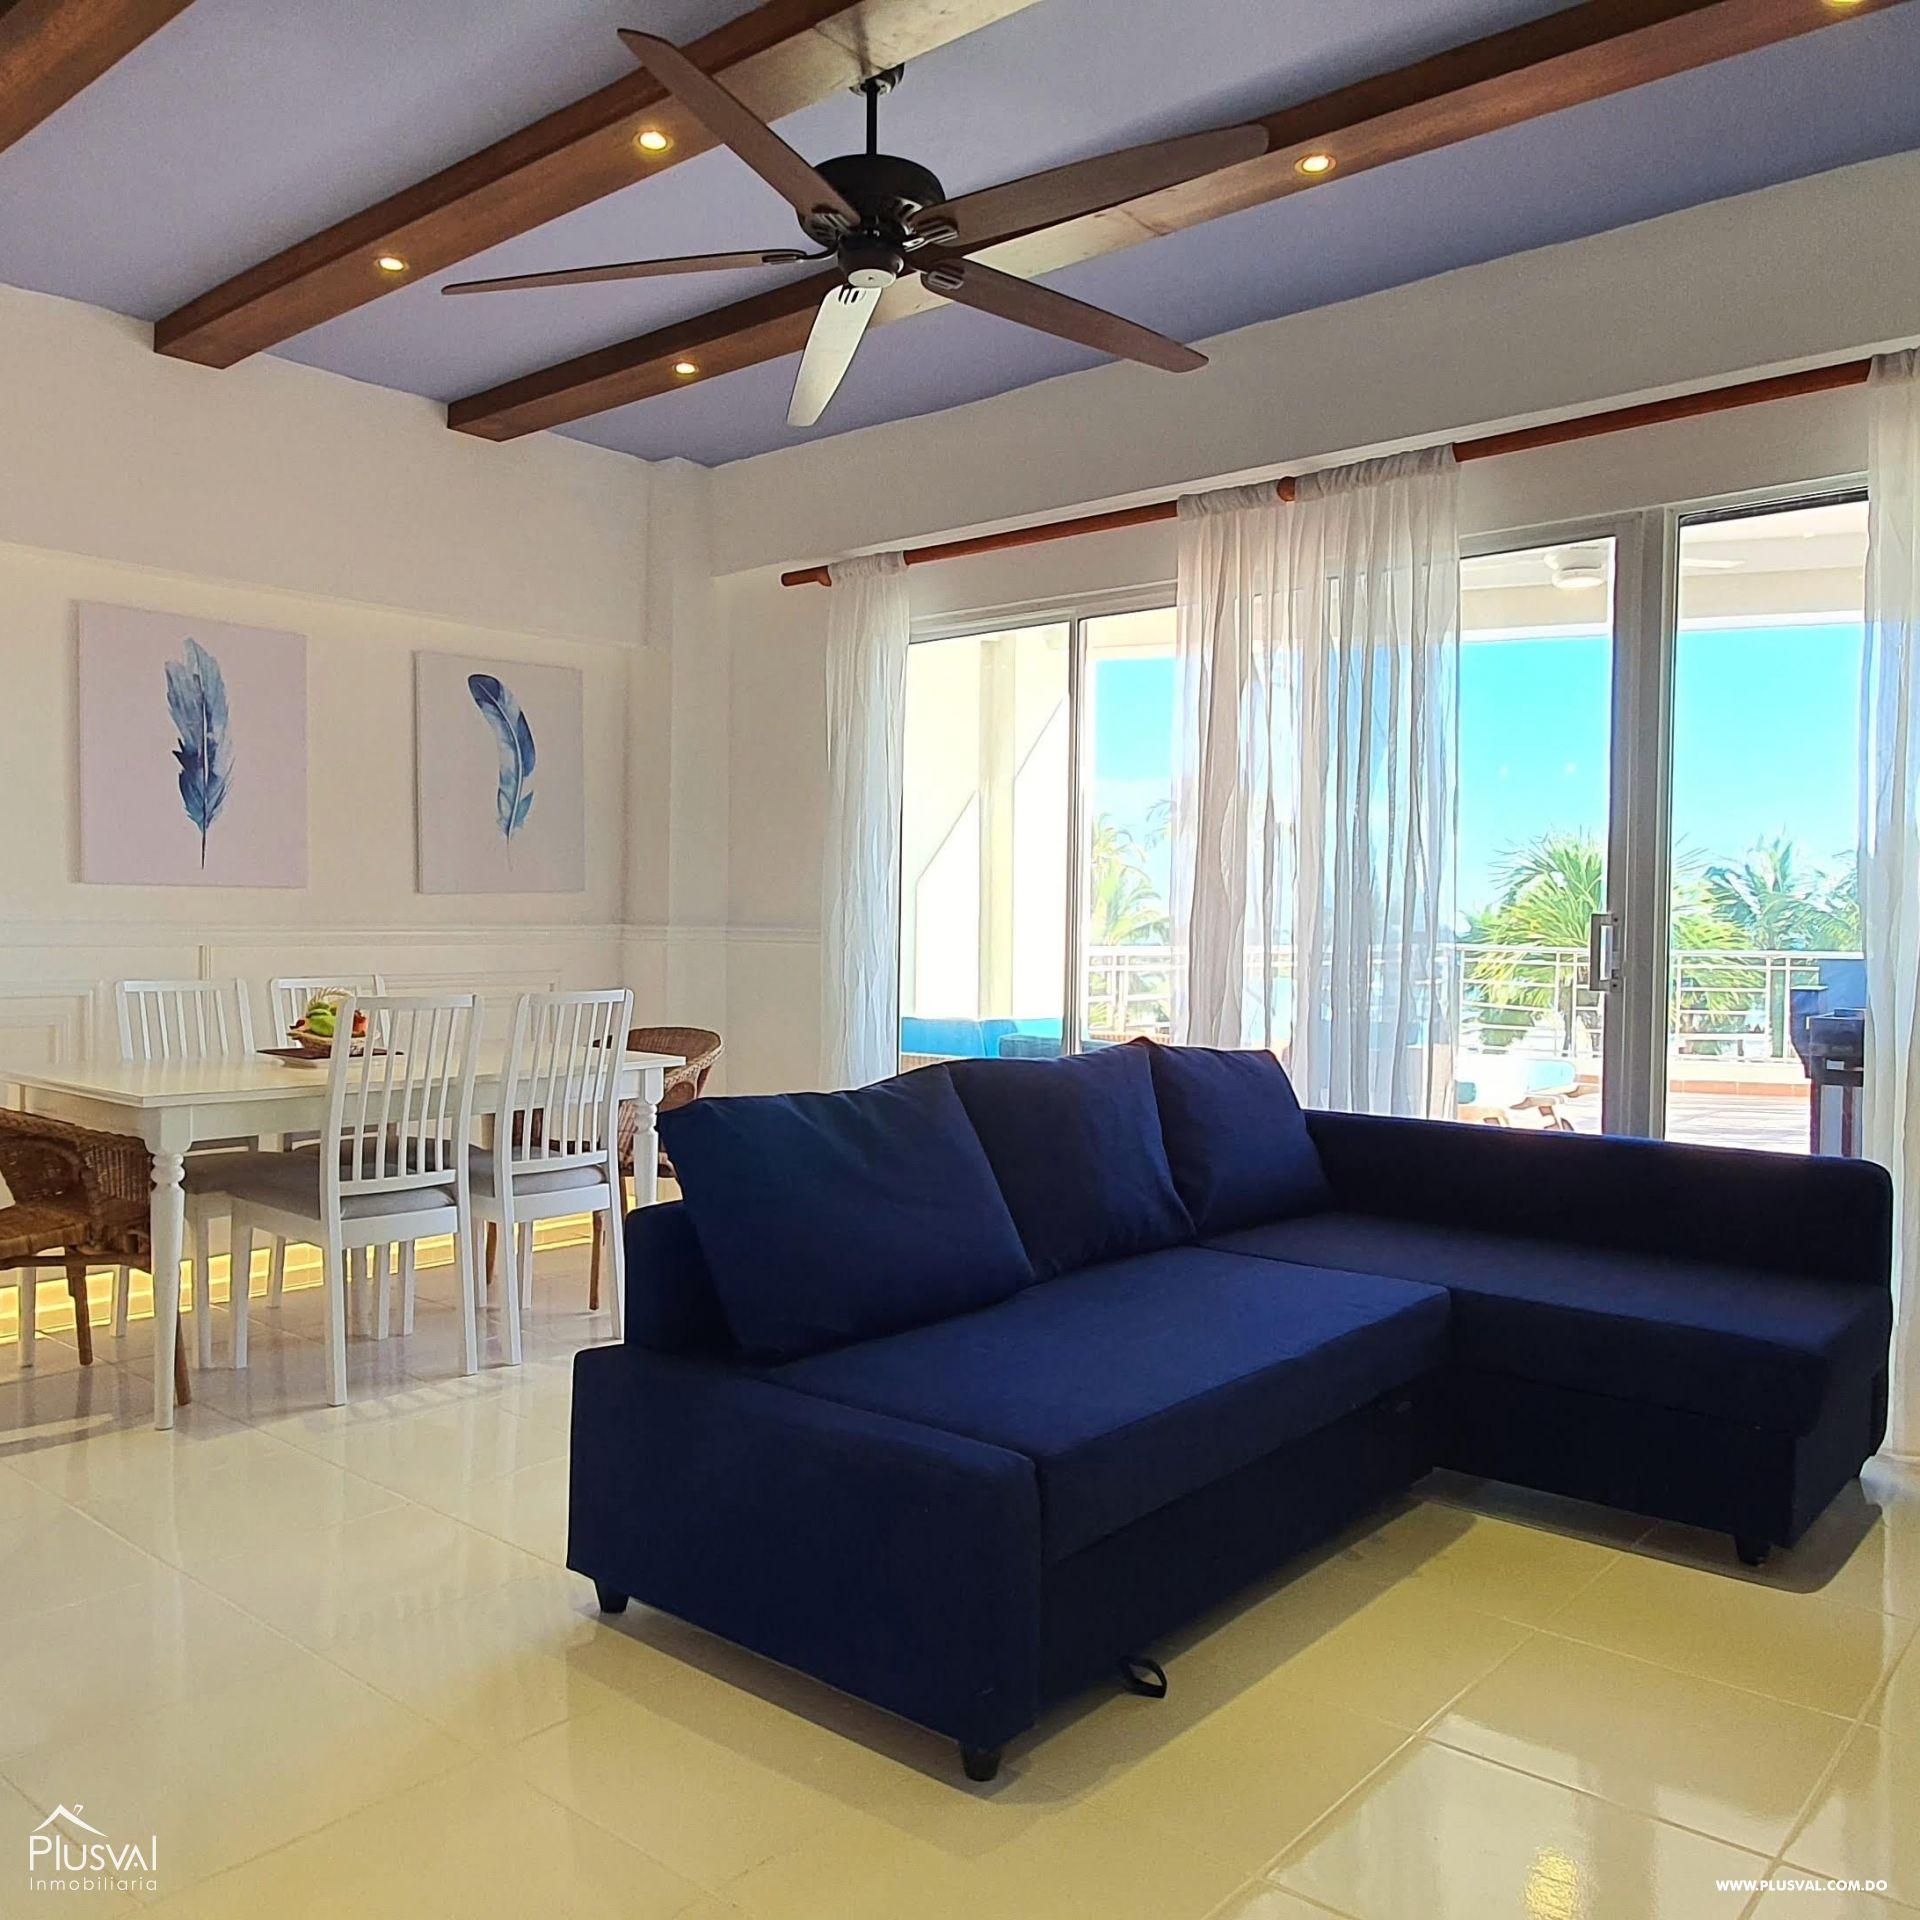 Alquiler apartamento Costa del Sol Juan Dolio 166779